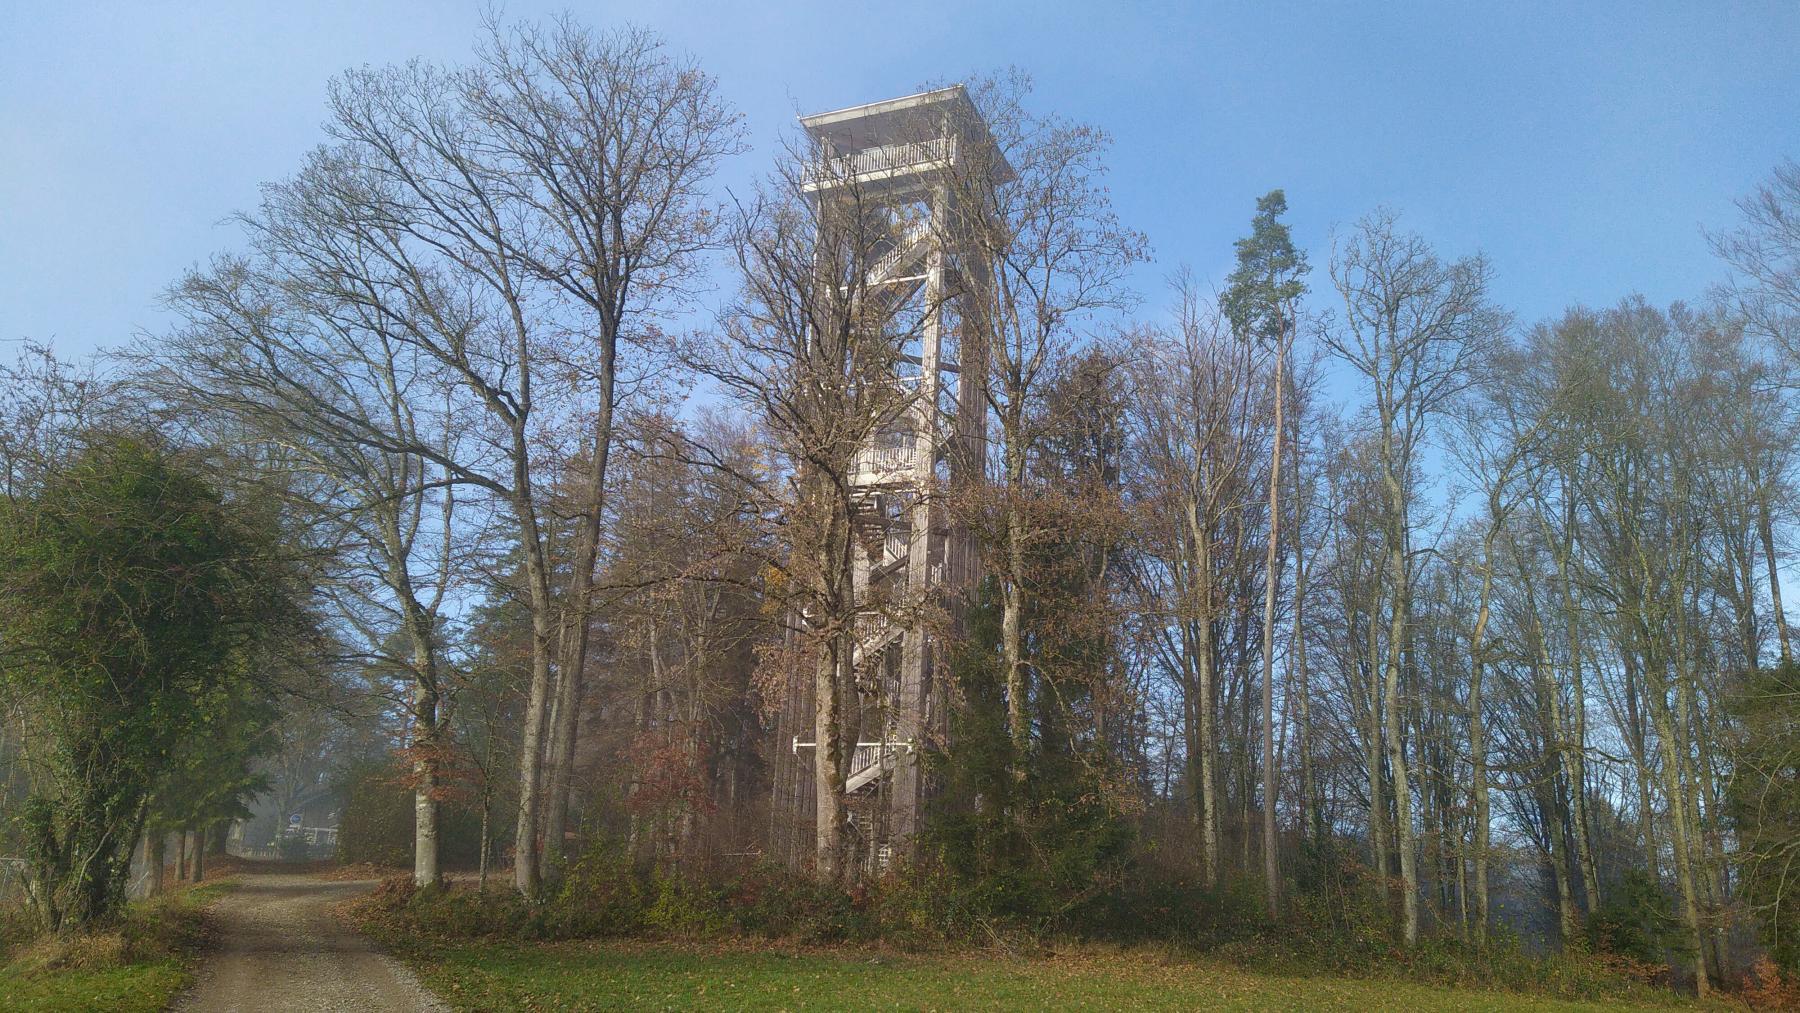 09 Altberg Turm (Waldschenke)